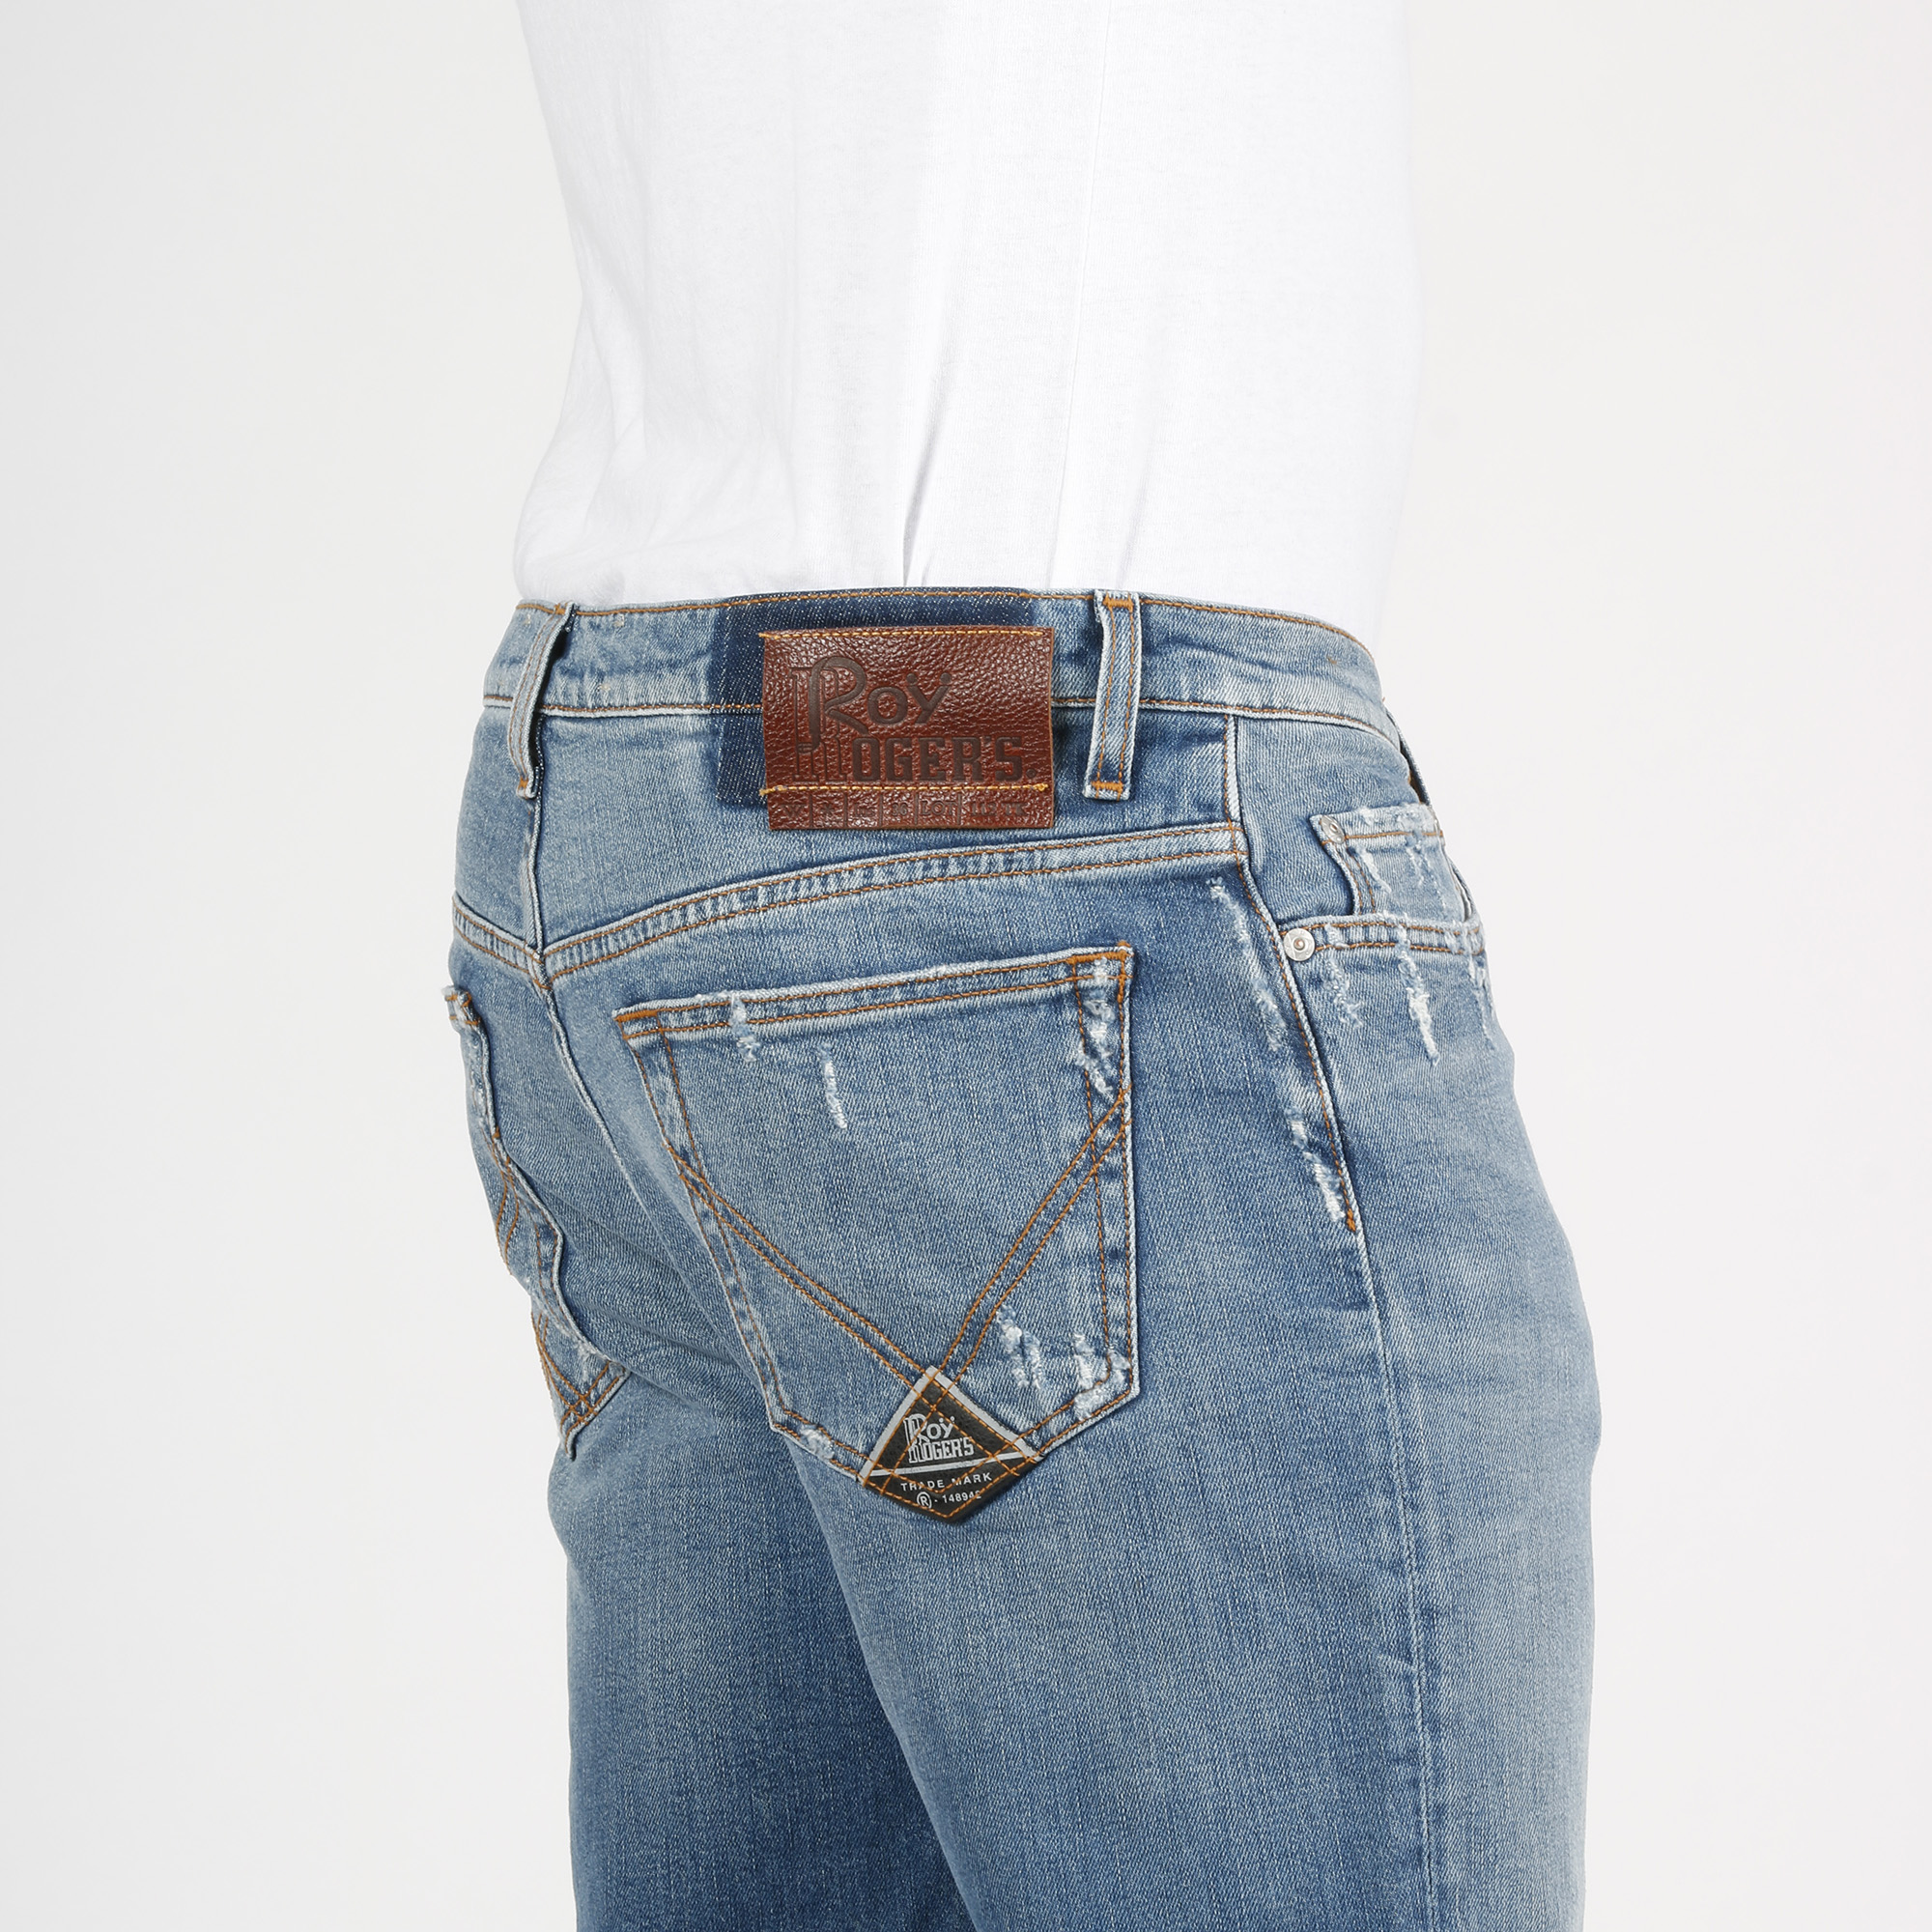 Jeans trechter - Denim